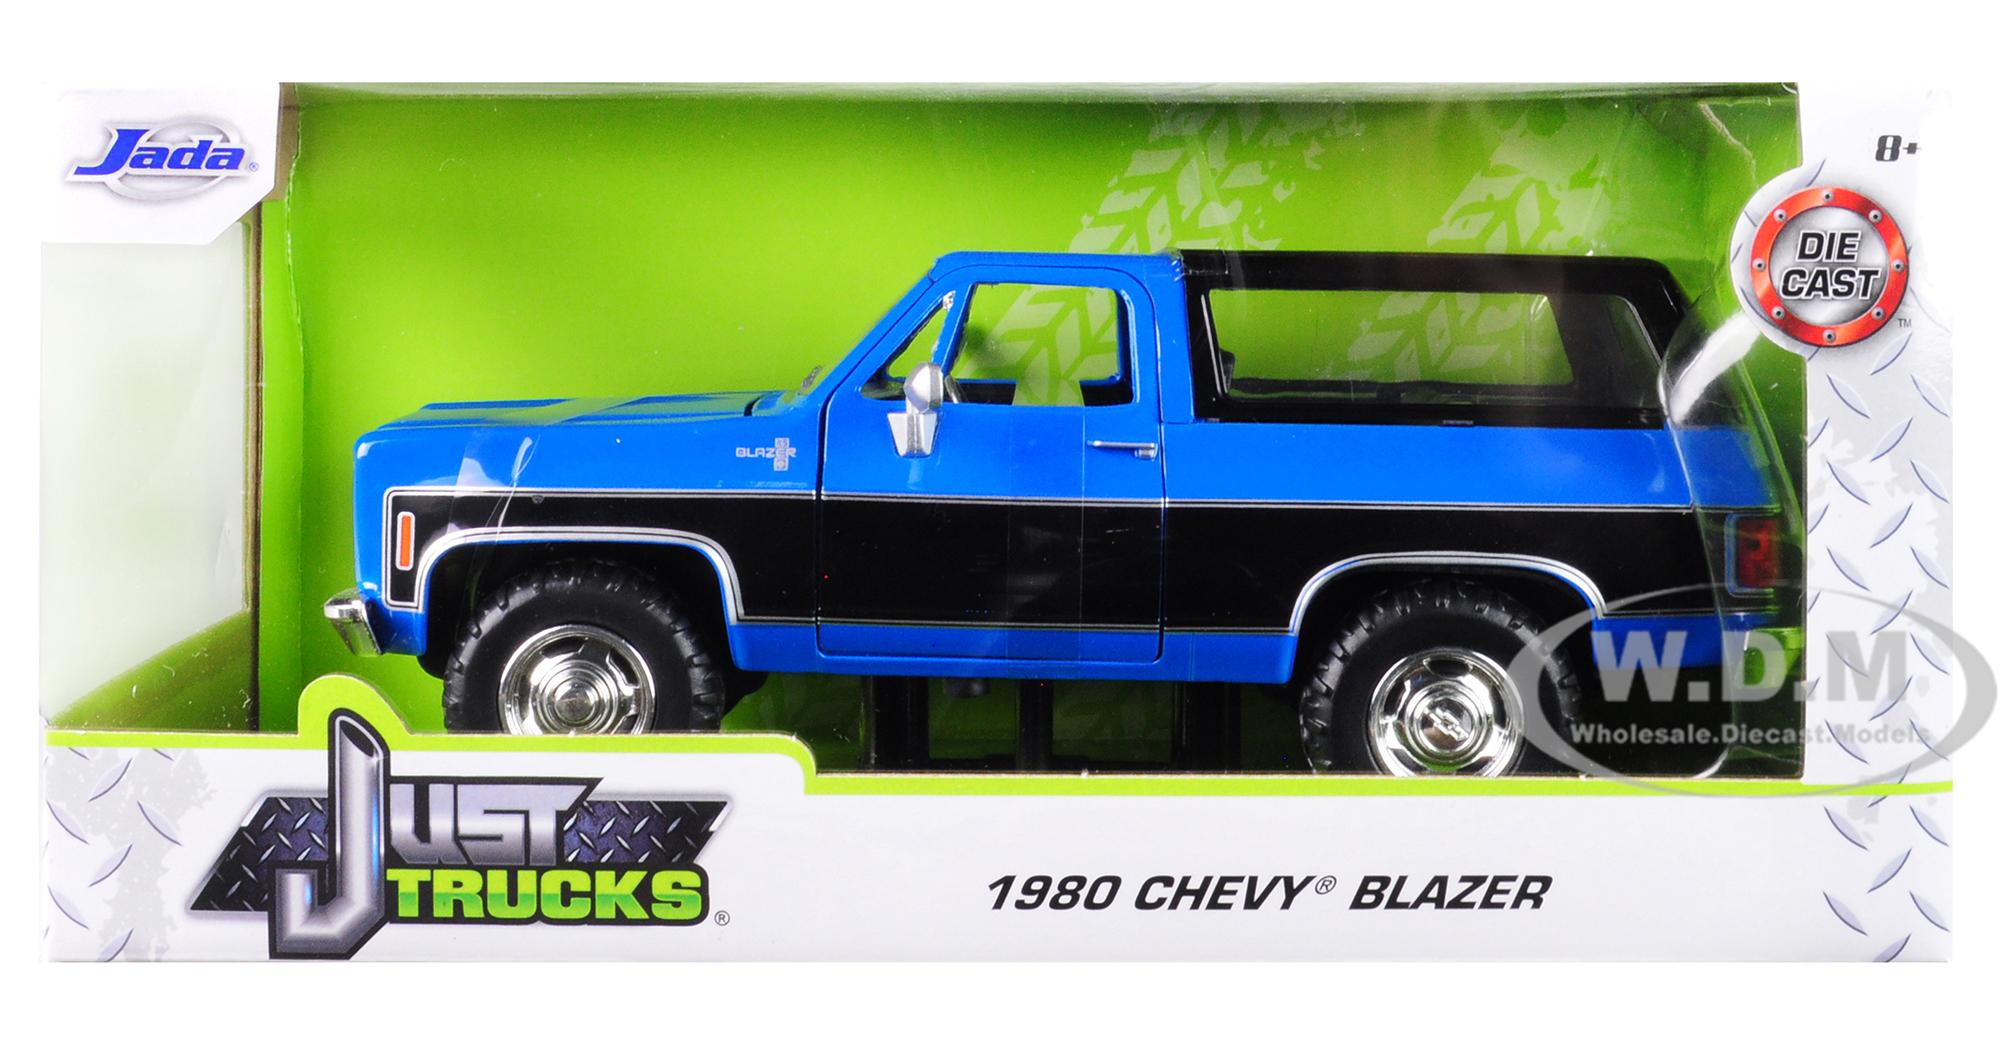 1980 Chevrolet Blazer K5 Blue and Black Just Trucks 1/24 Diecast Model Car by Jada